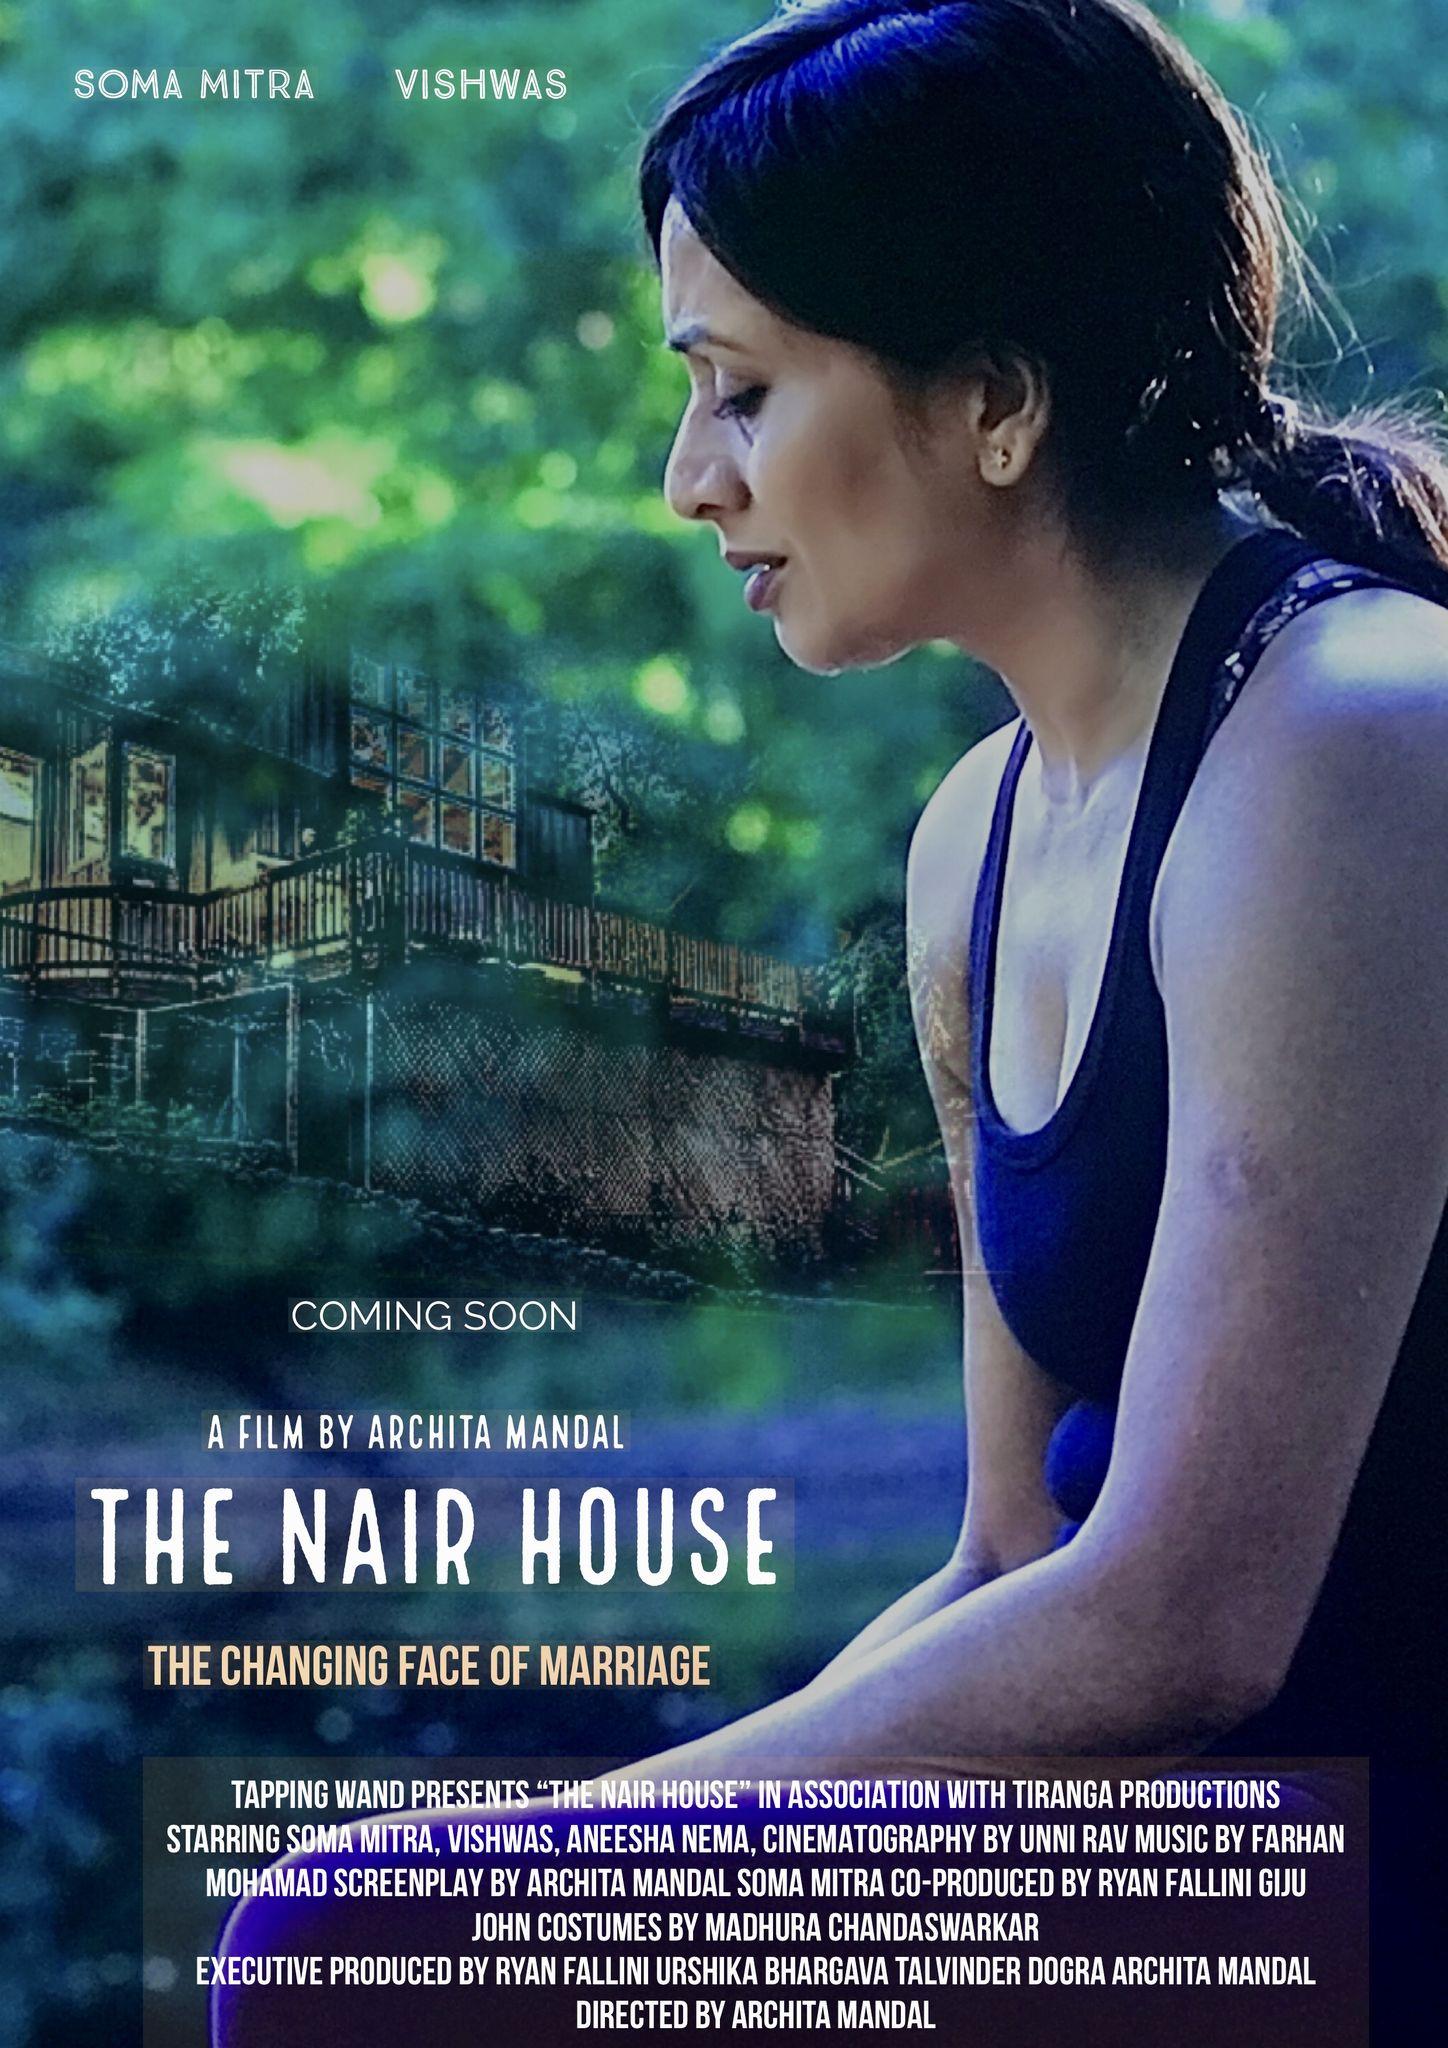 The Nair House